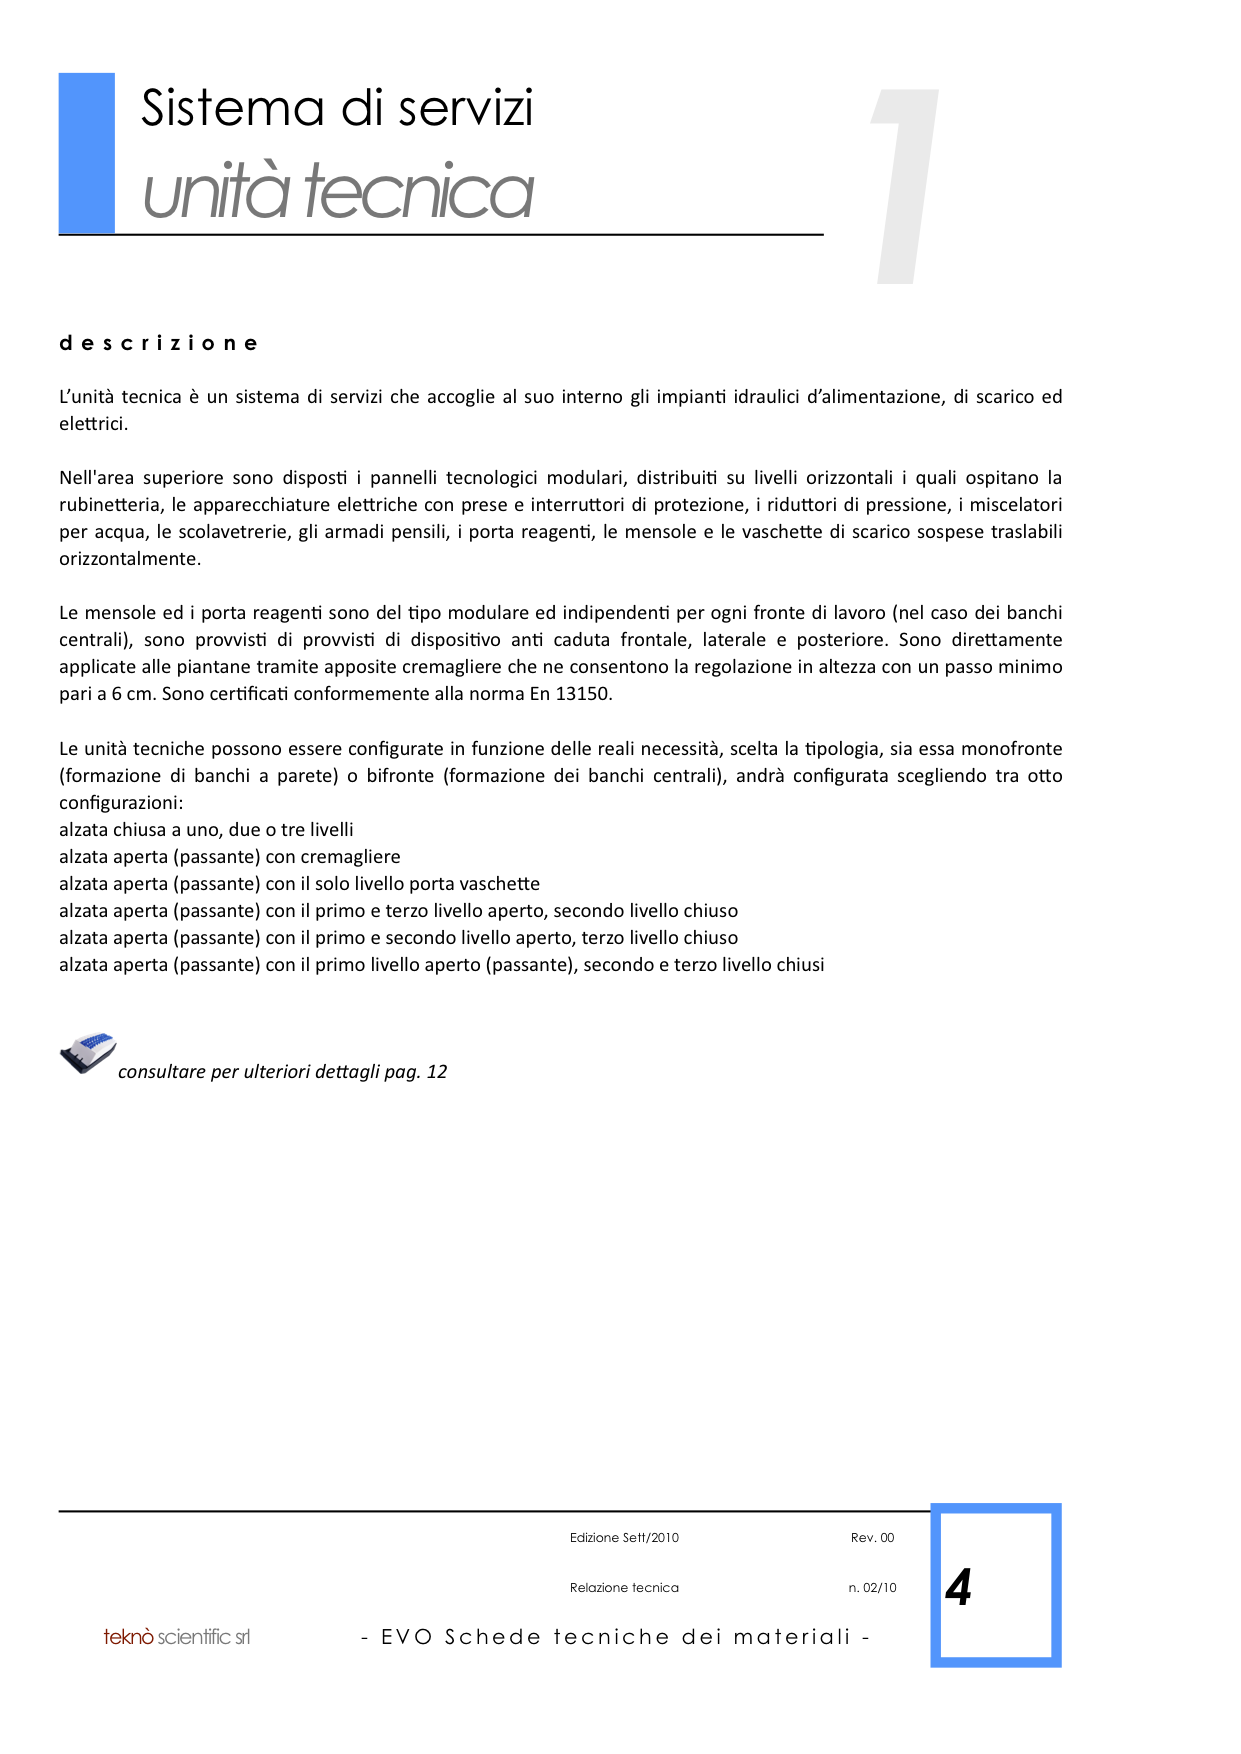 EVO Schede Tecniche materiali copia 4.png